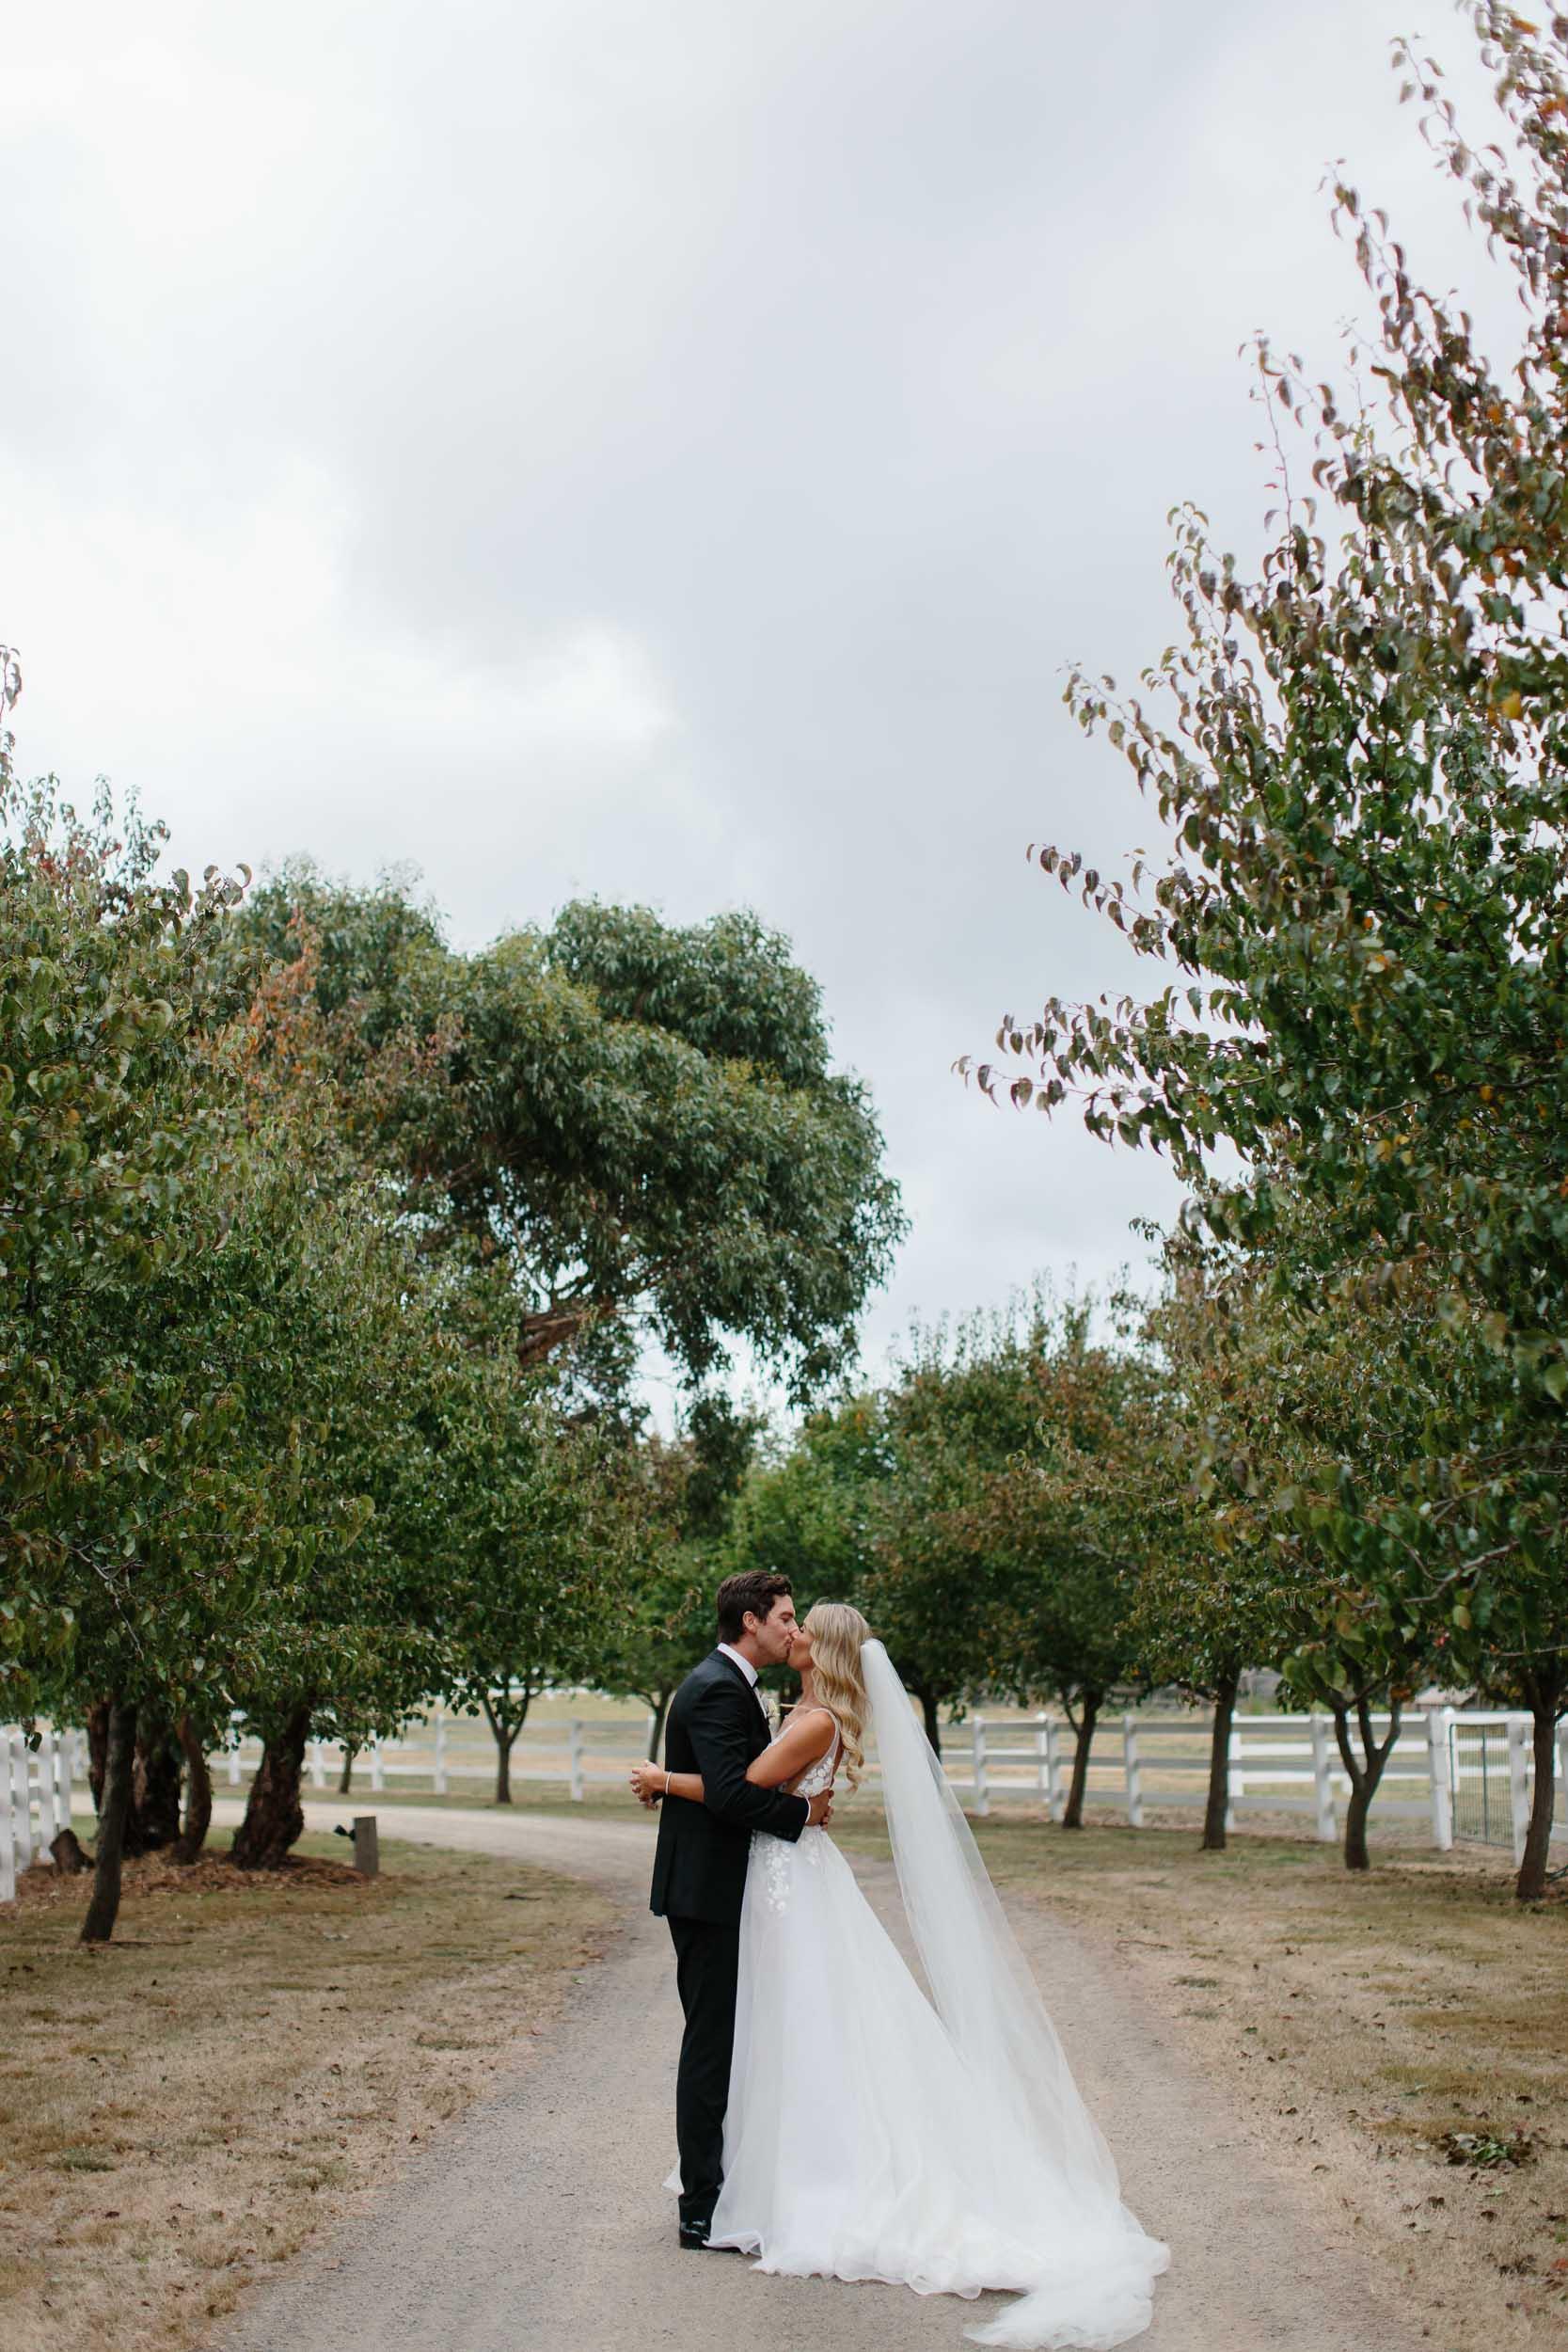 Kas-Richards-Mornington-Peninsula-Private-Property-Wedding-Marianna-Hardwick-Gown-492.jpg